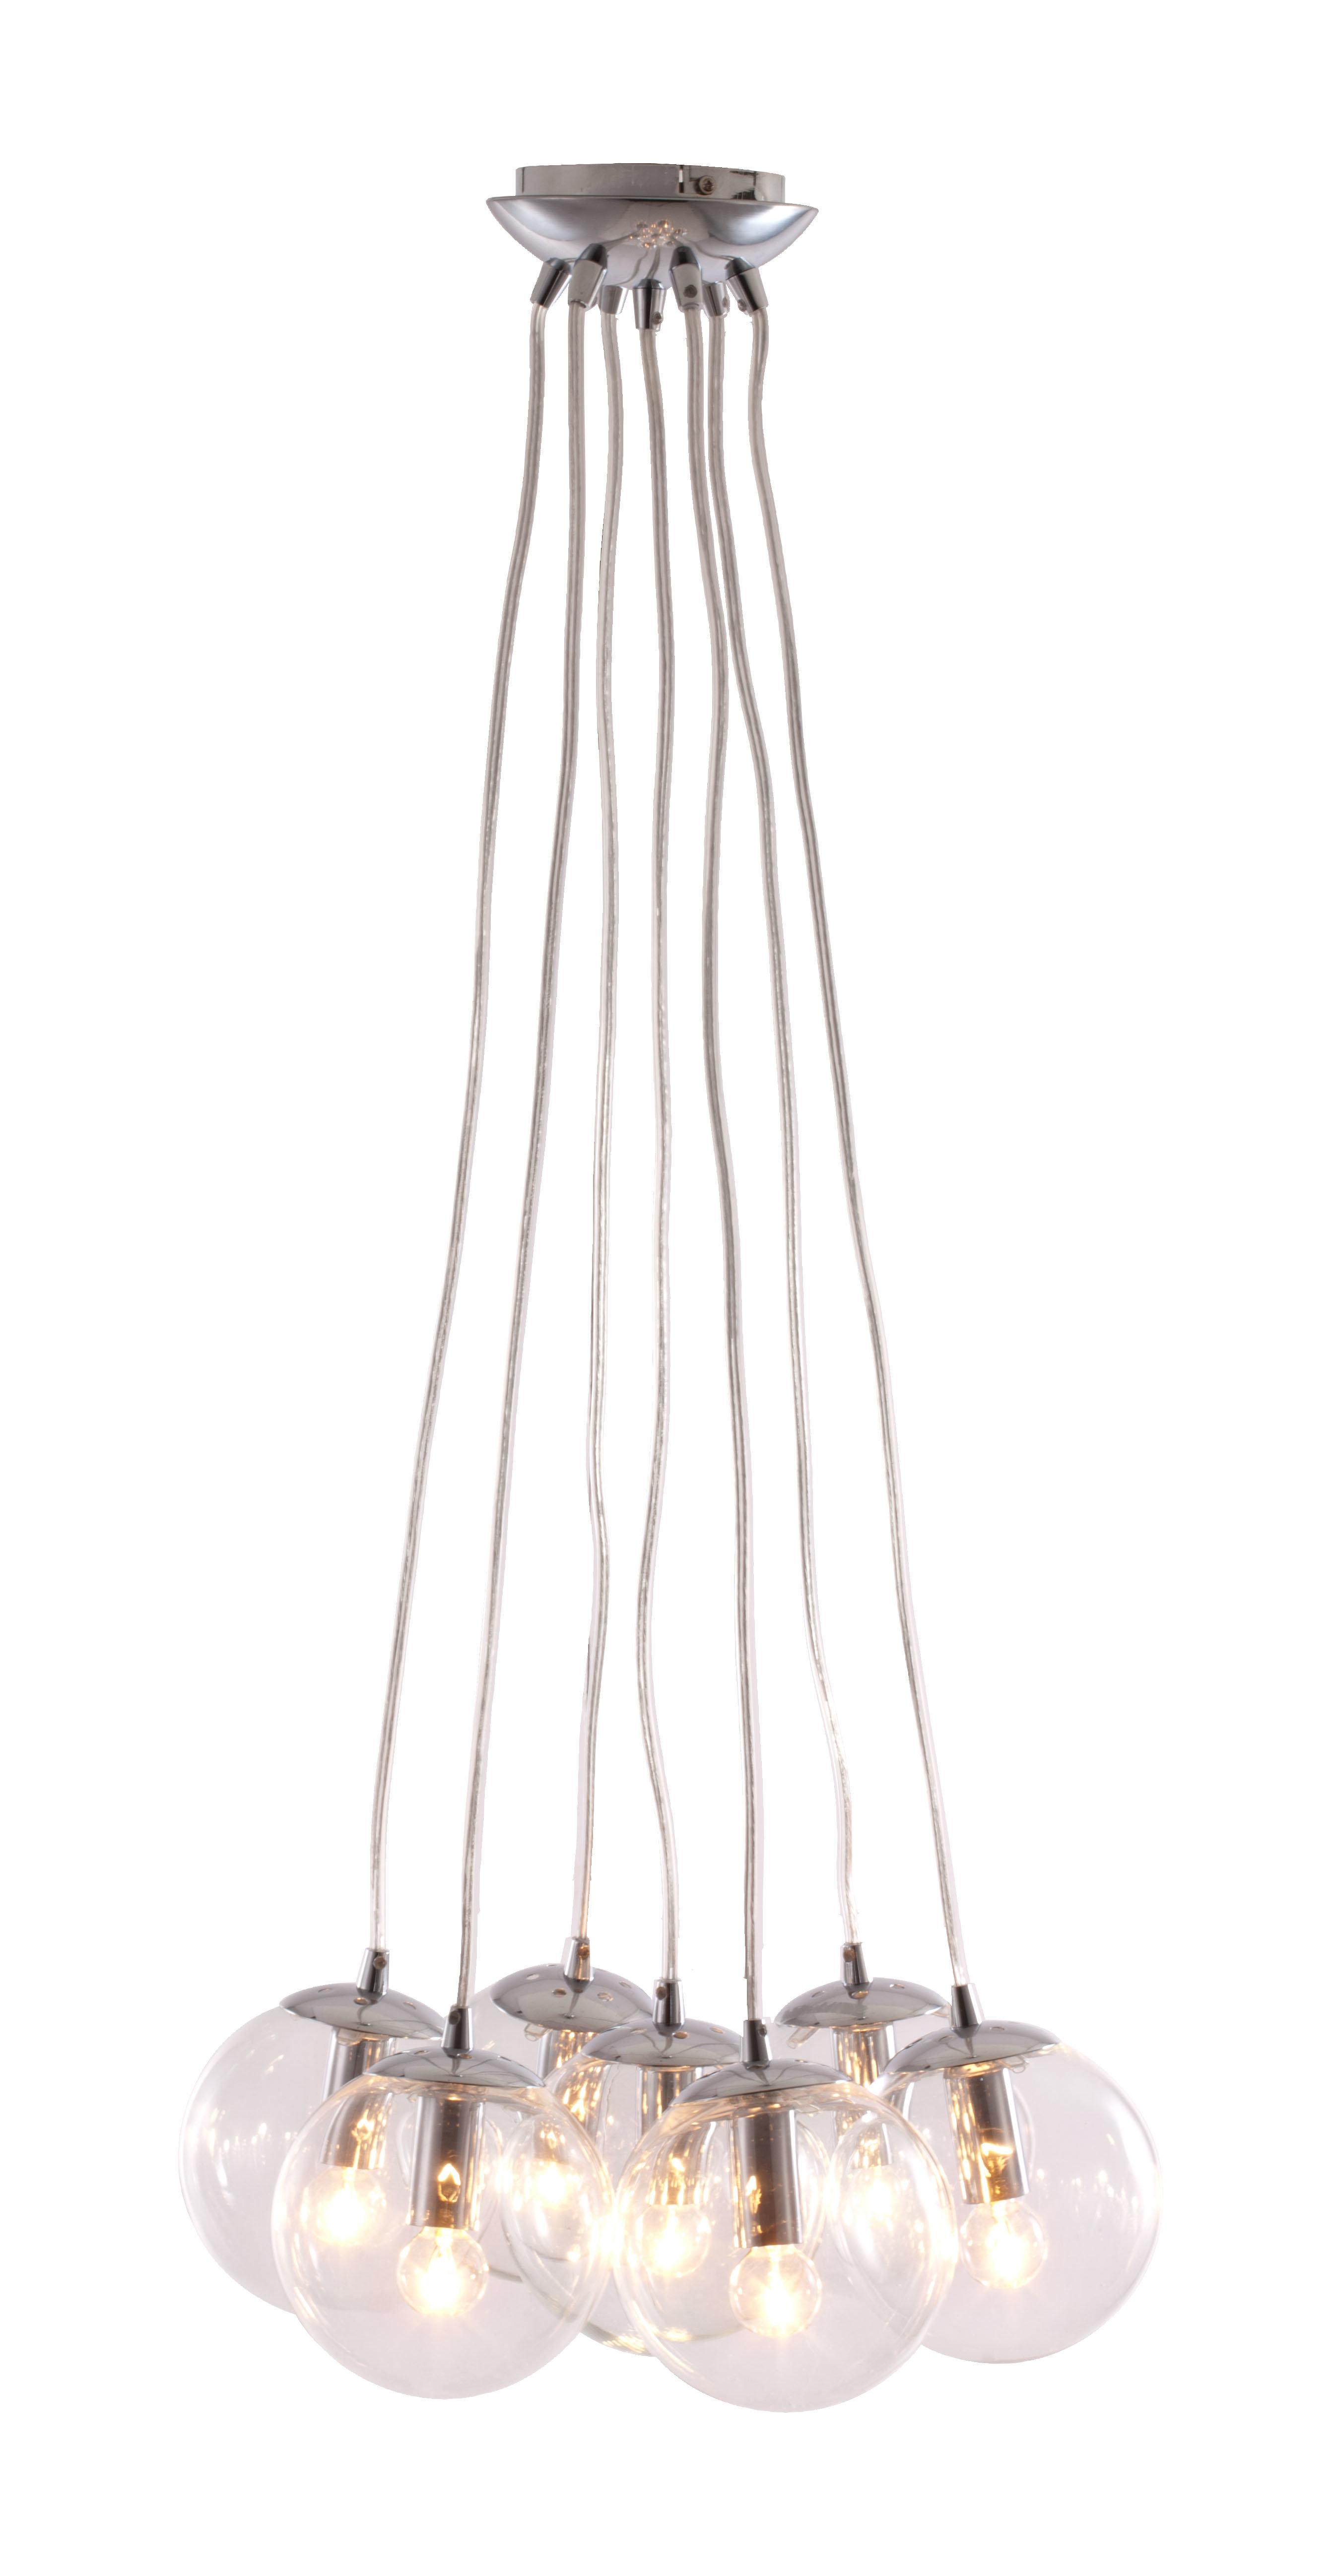 Roni 7 Bulb Cluster Pendant Pertaining To Neal 9 Light Kitchen Island Teardrop Pendants (Photo 22 of 30)